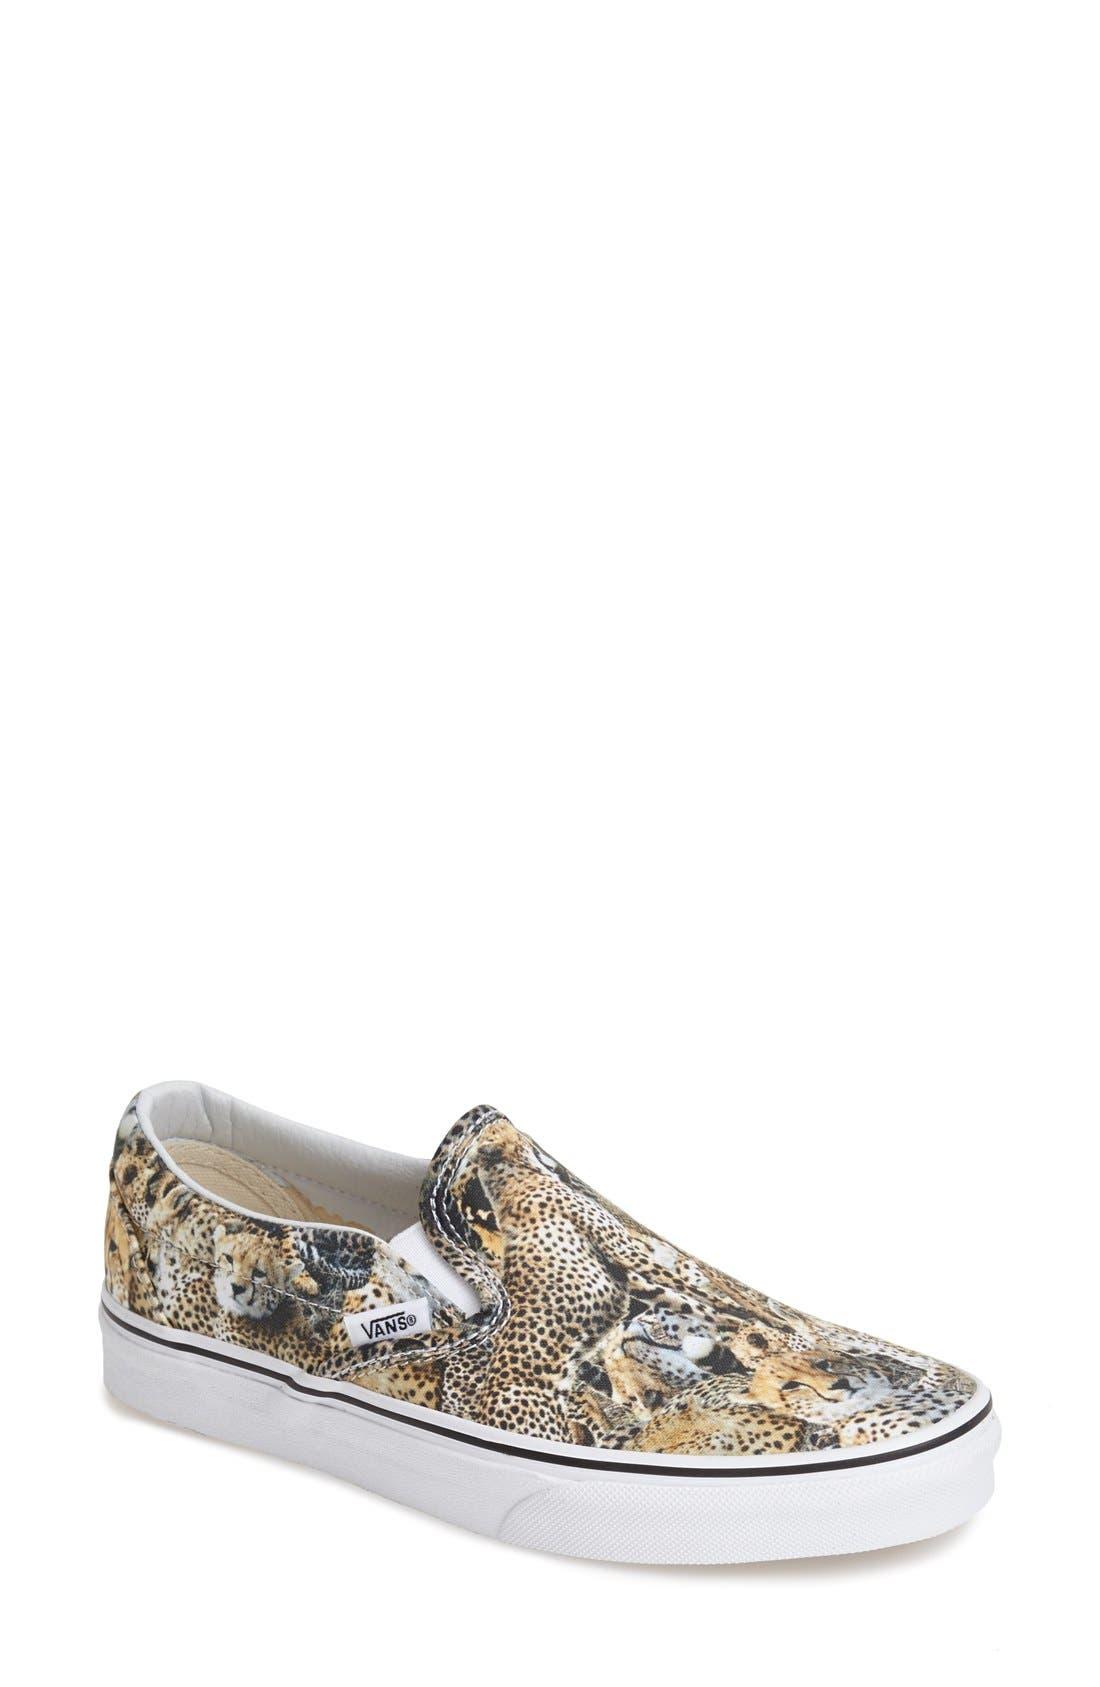 Alternate Image 1 Selected - Vans 'Classic - Kenya' Slip-On Sneaker (Women)